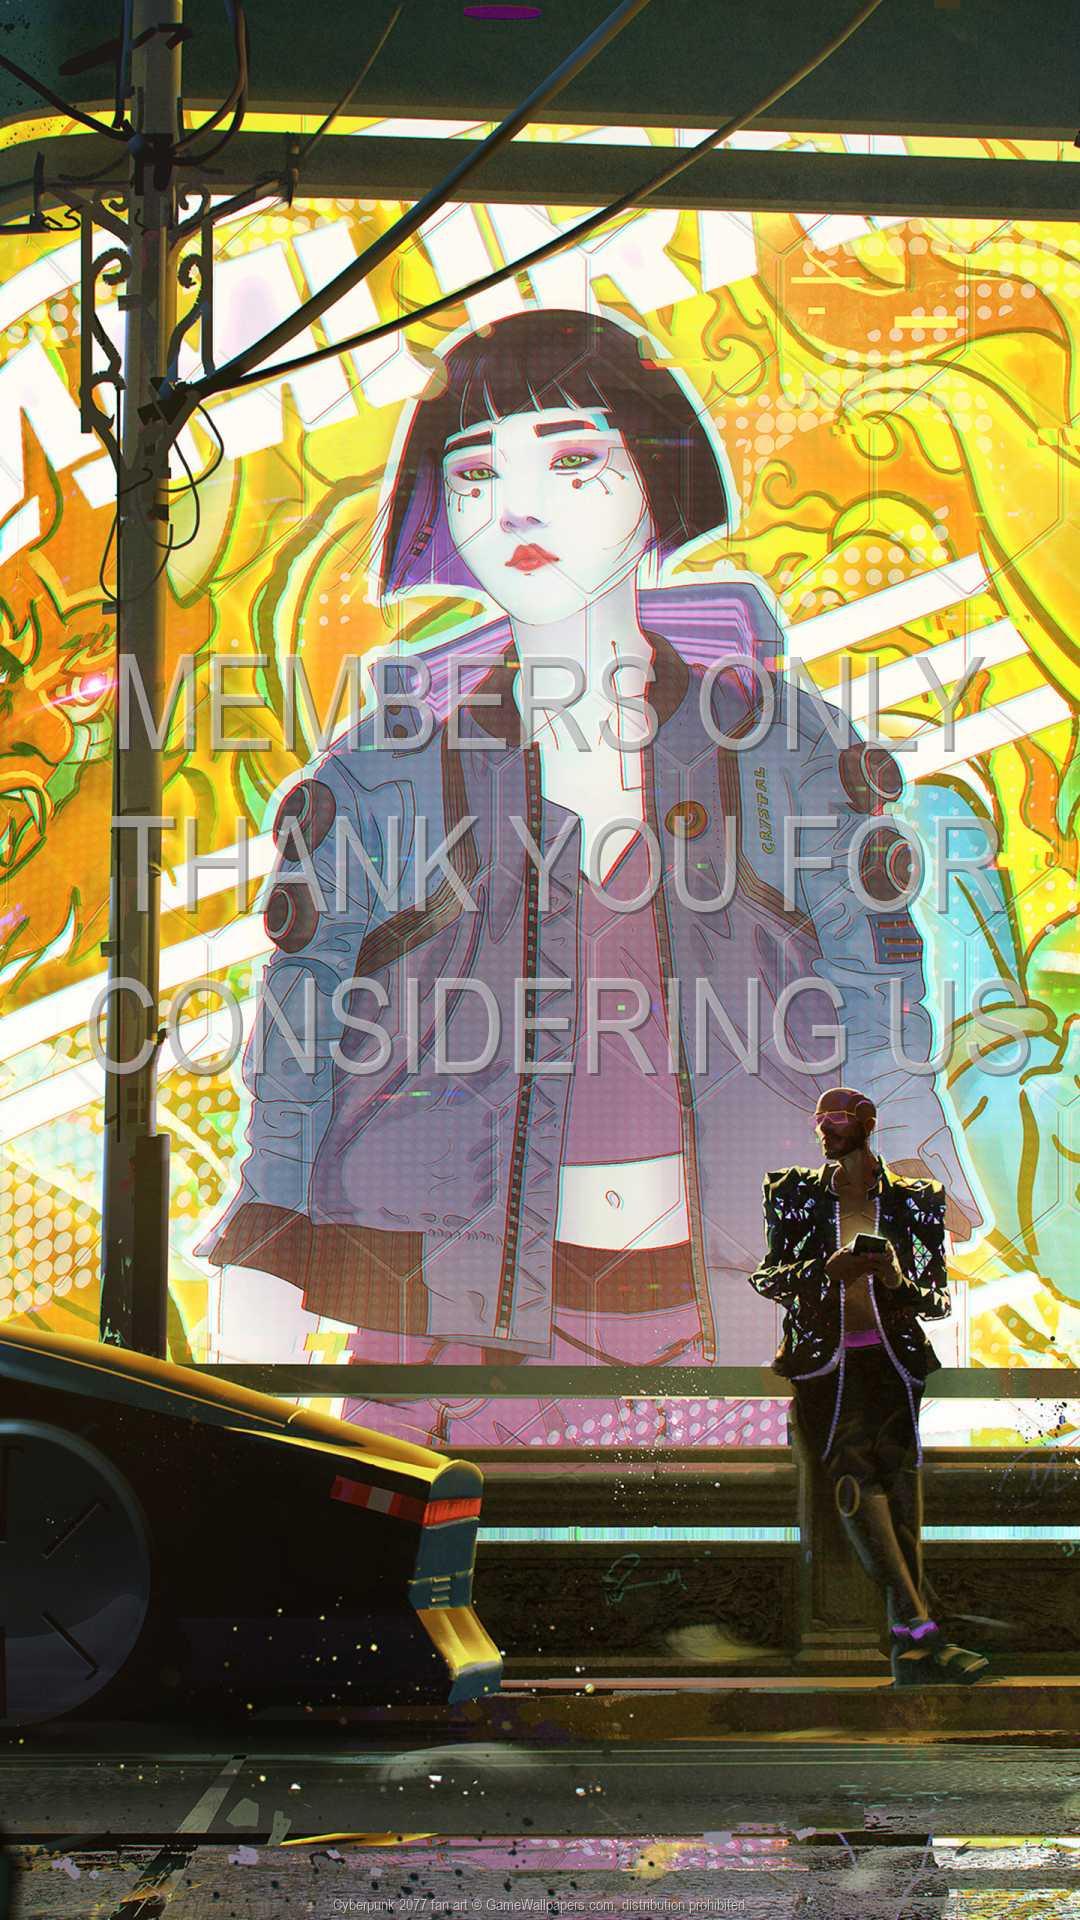 Cyberpunk 2077 fan art 1080p Vertical Mobile wallpaper or background 05